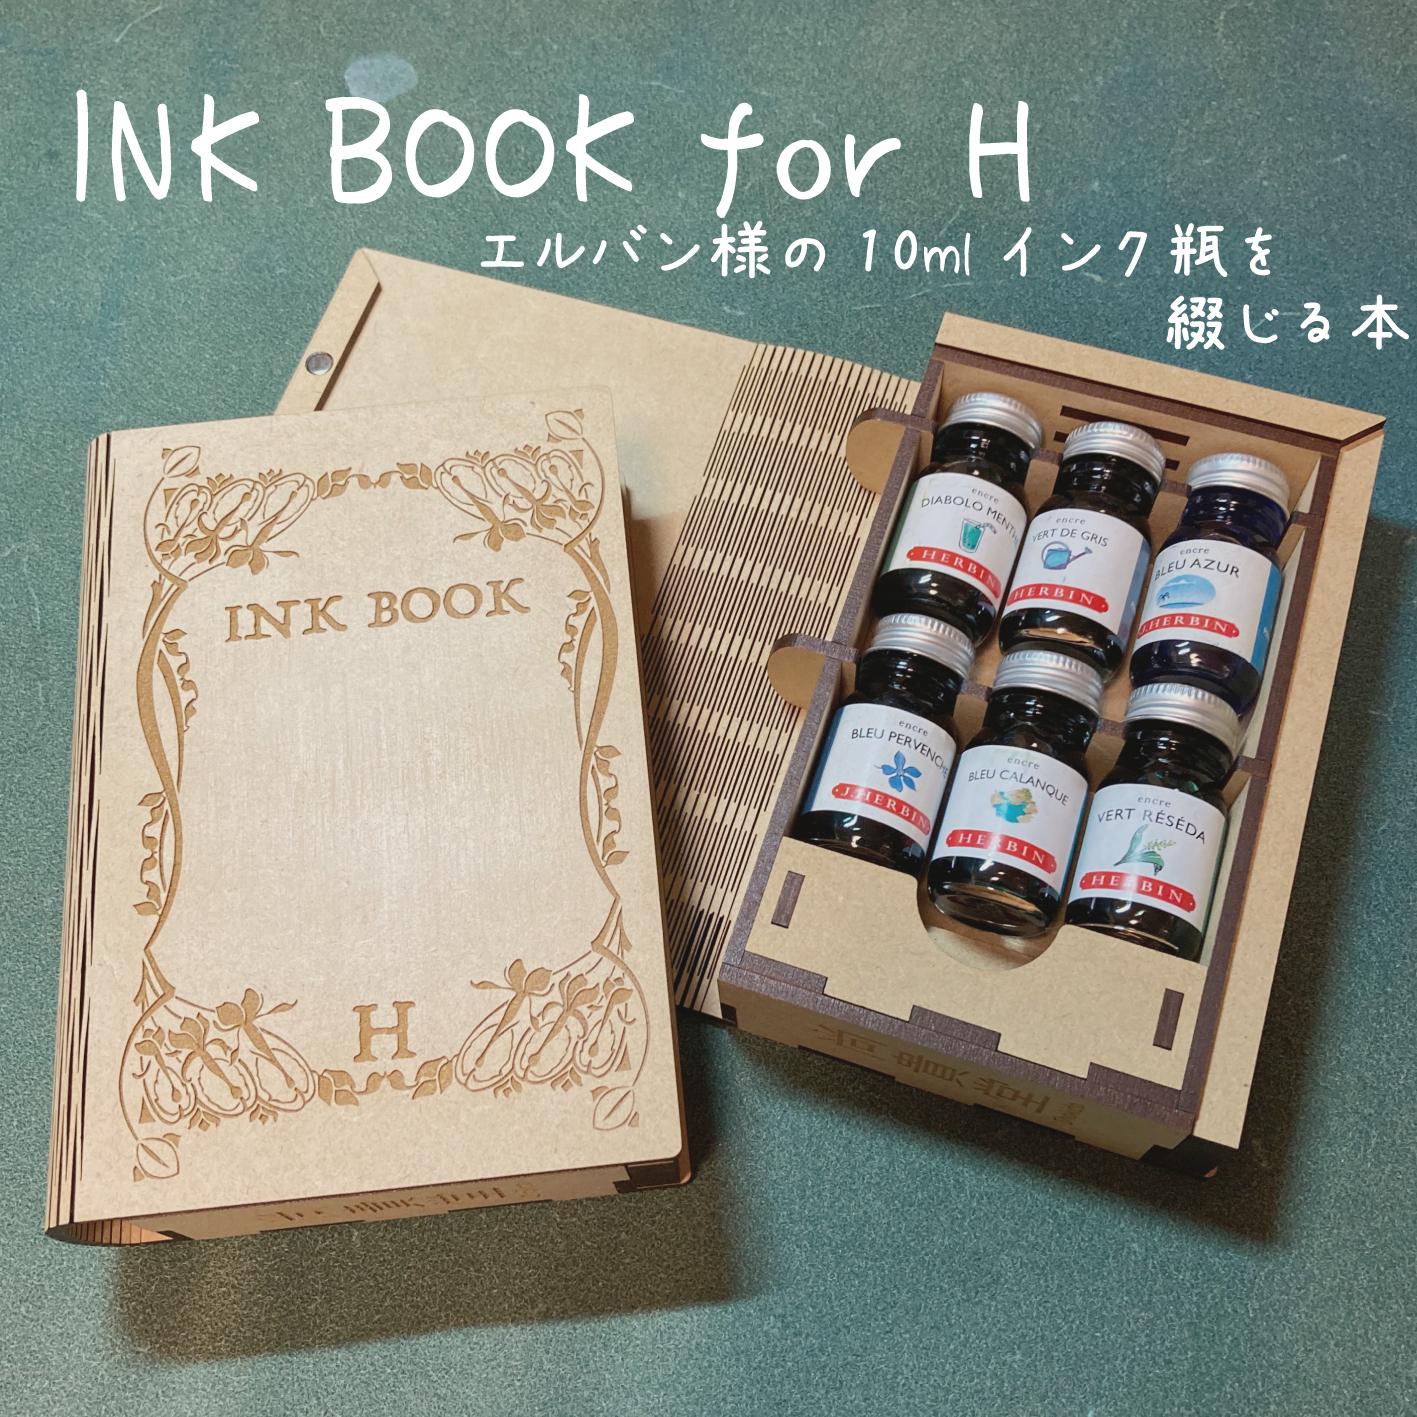 INK BOOK for H(エルバン10mlボトル対応)